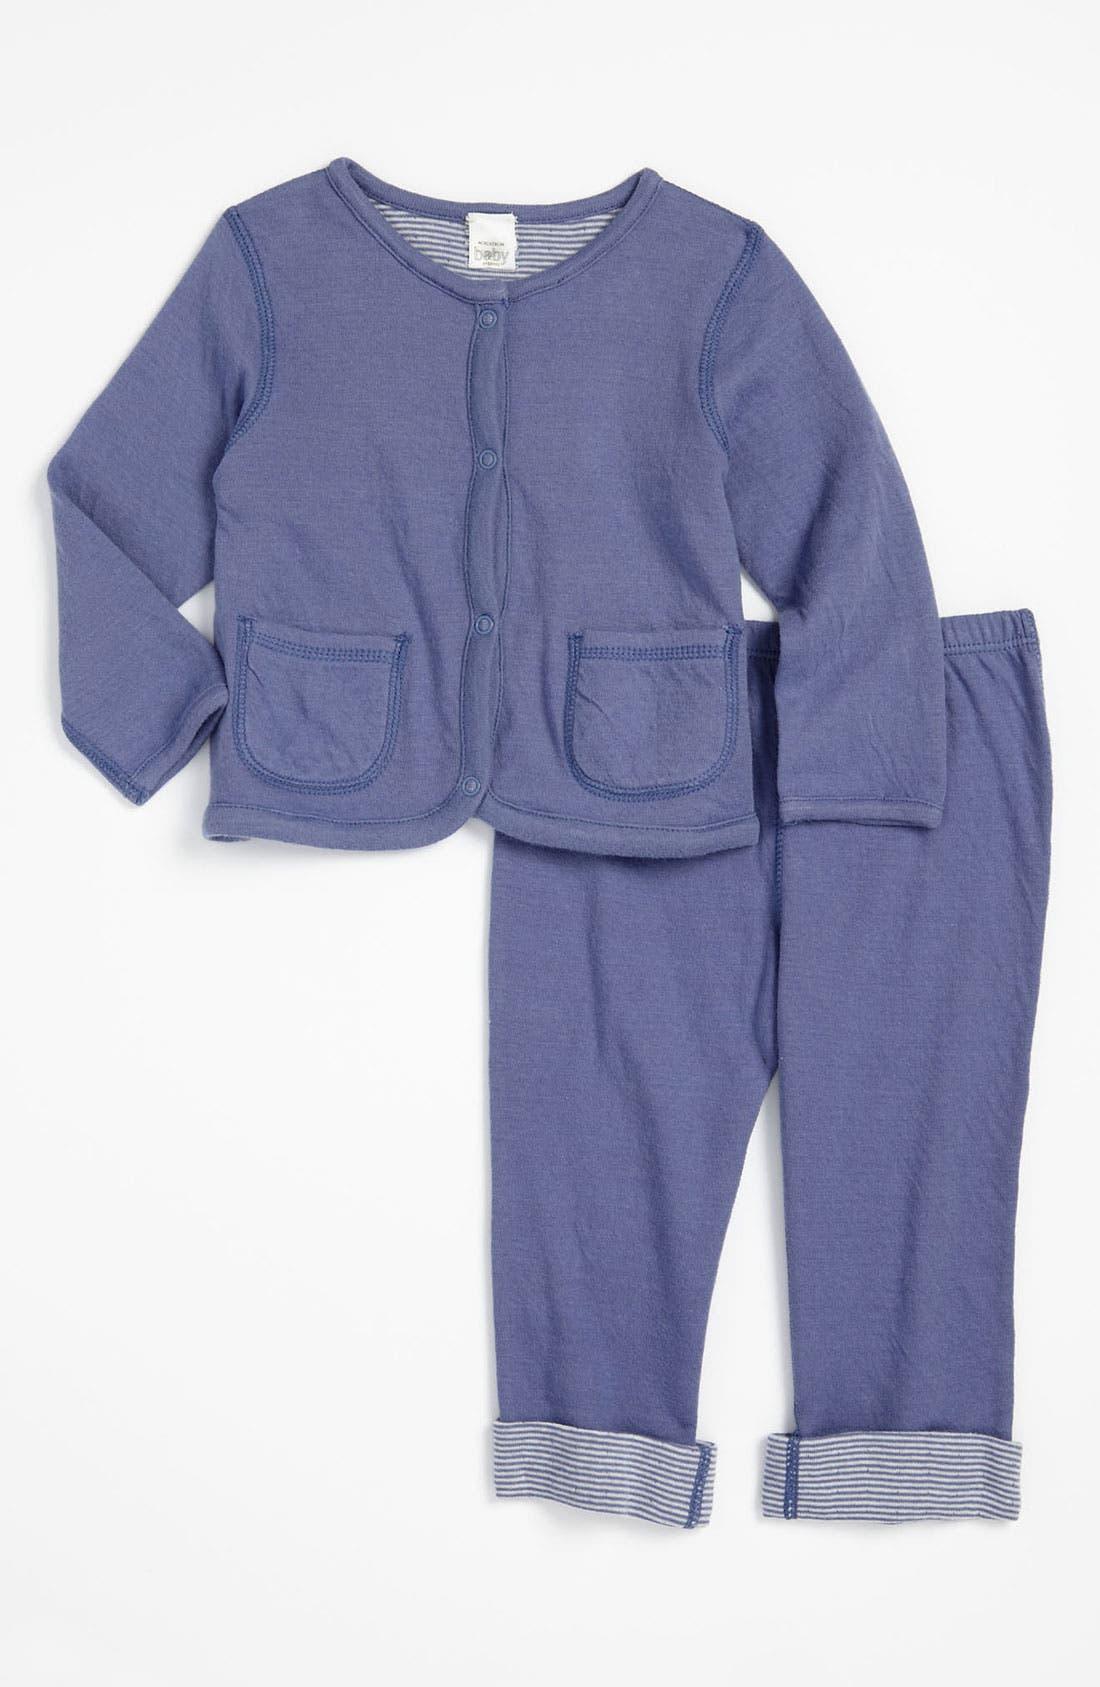 Main Image - Nordstrom Baby Reversible Jacket & Leggings (Infant)